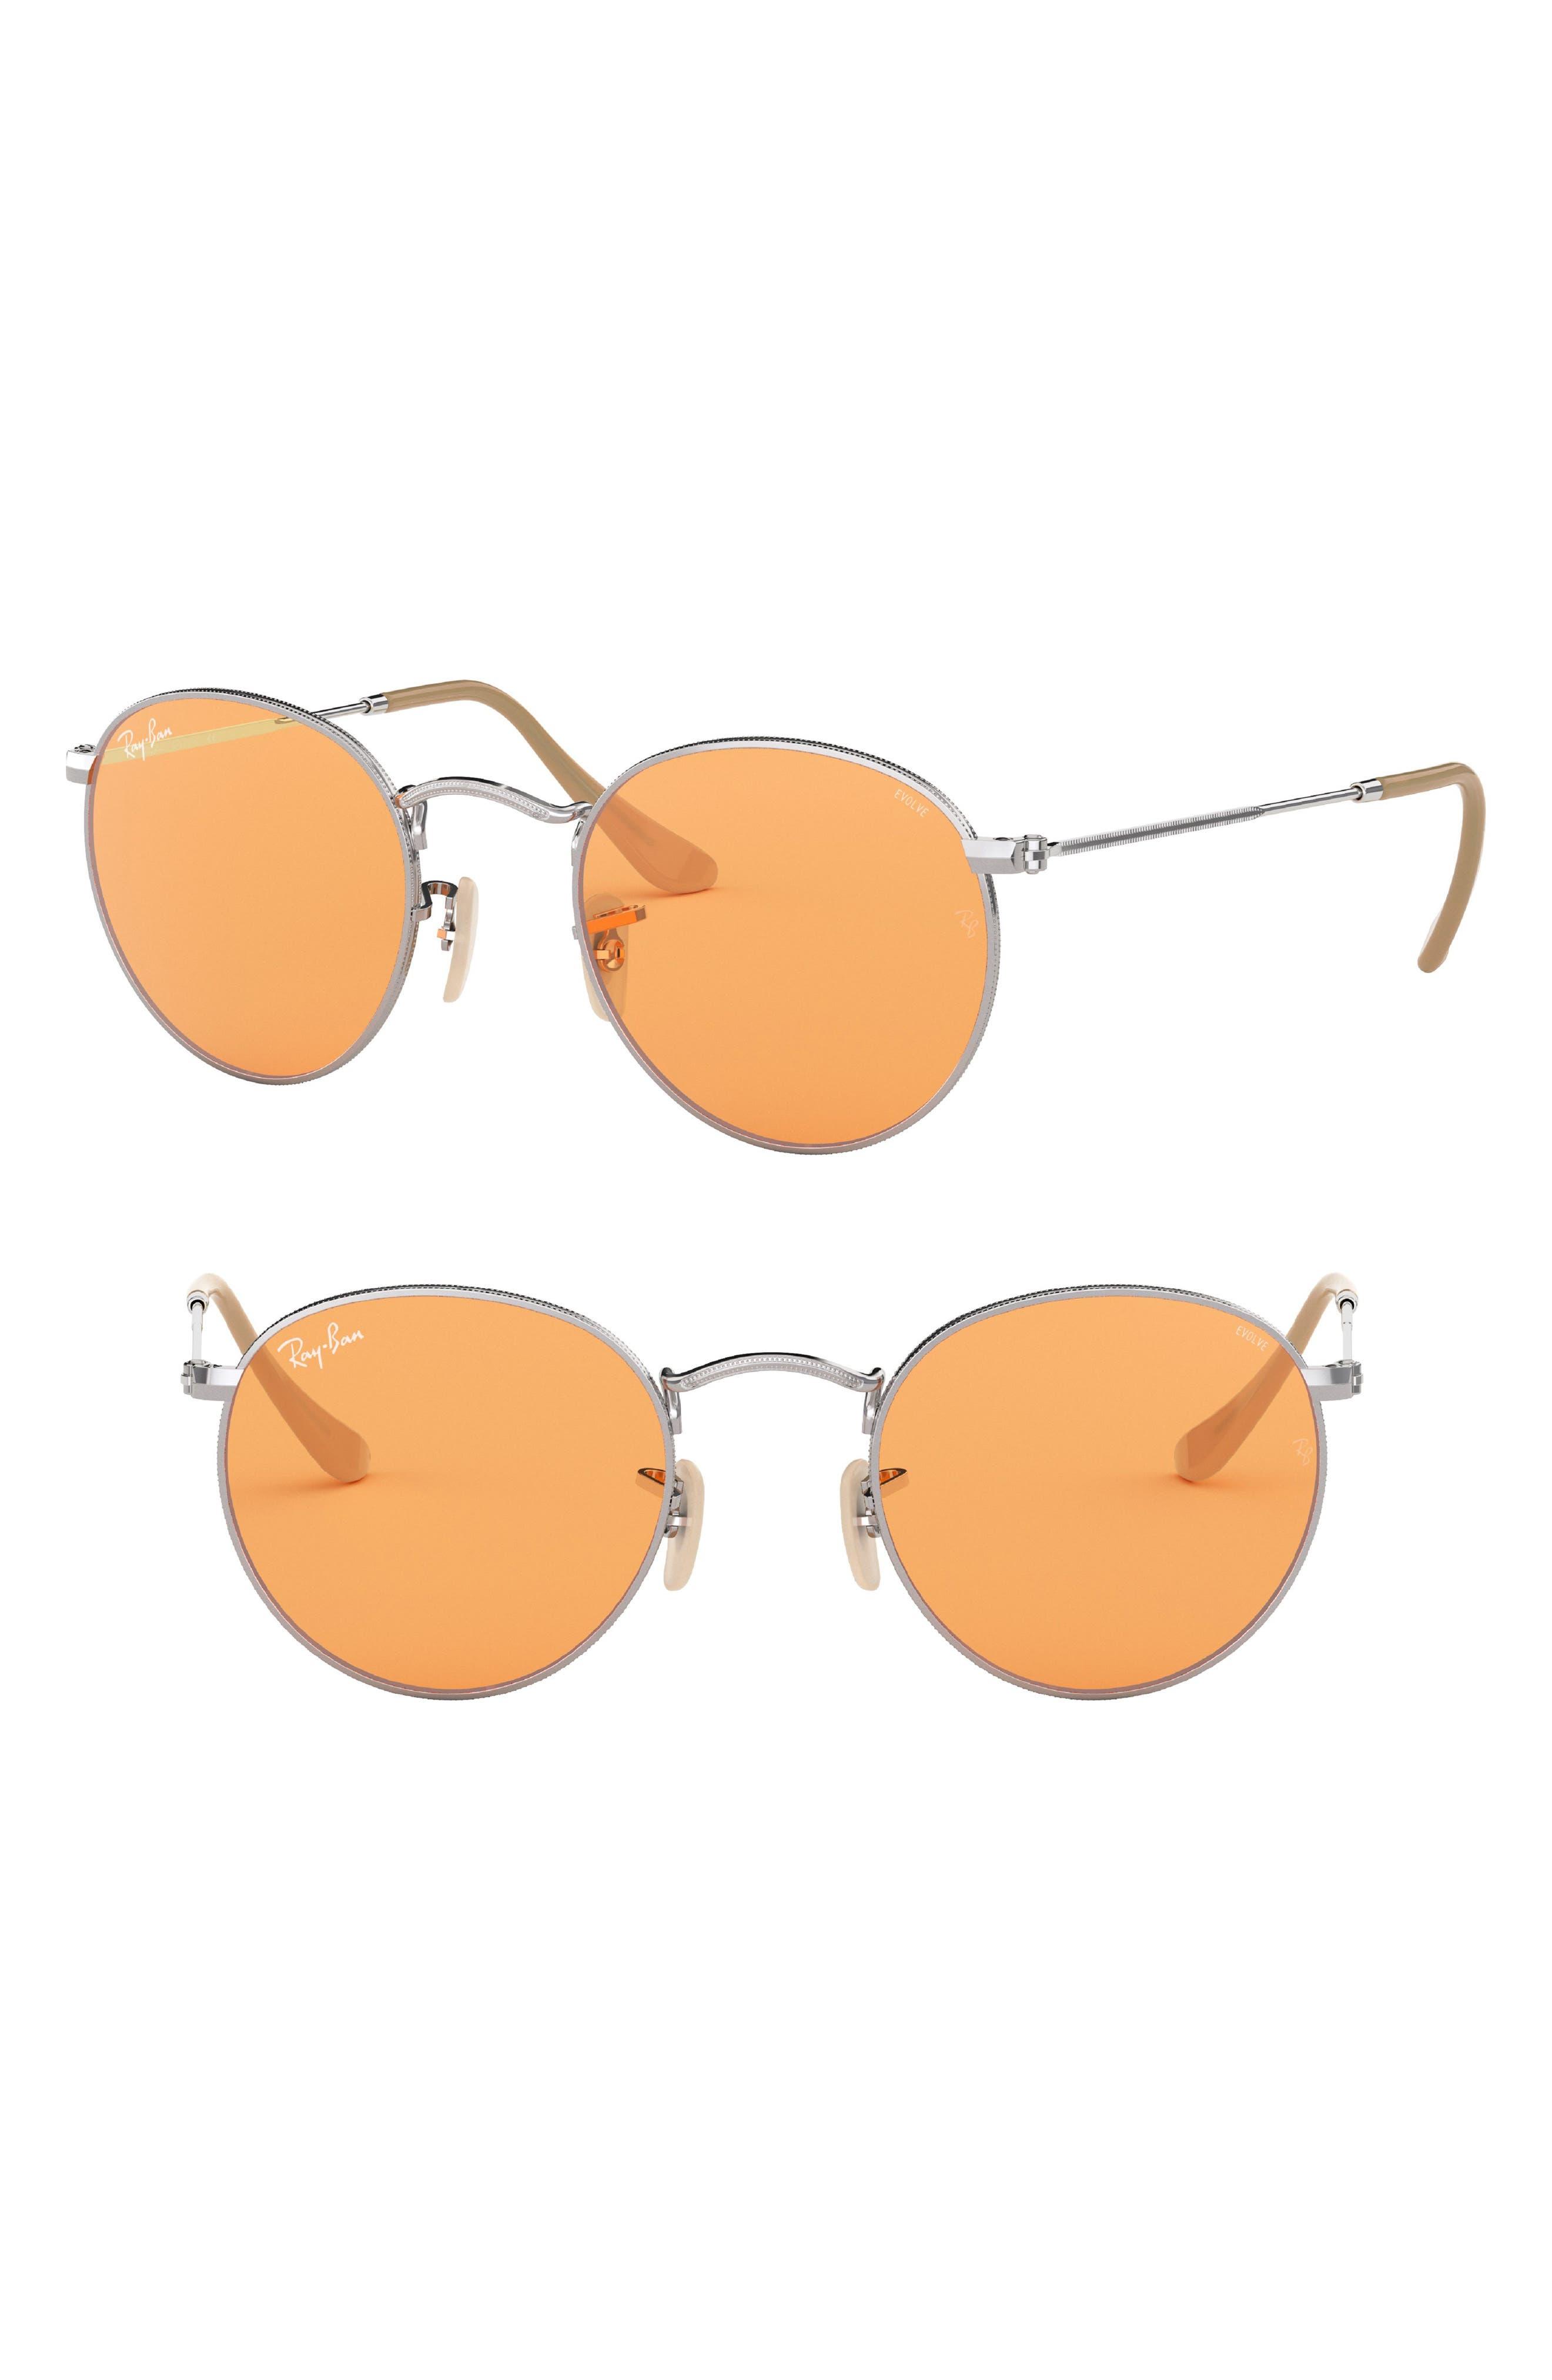 50mm Retro Inspired Round Metal Sunglasses,                         Main,                         color, 043